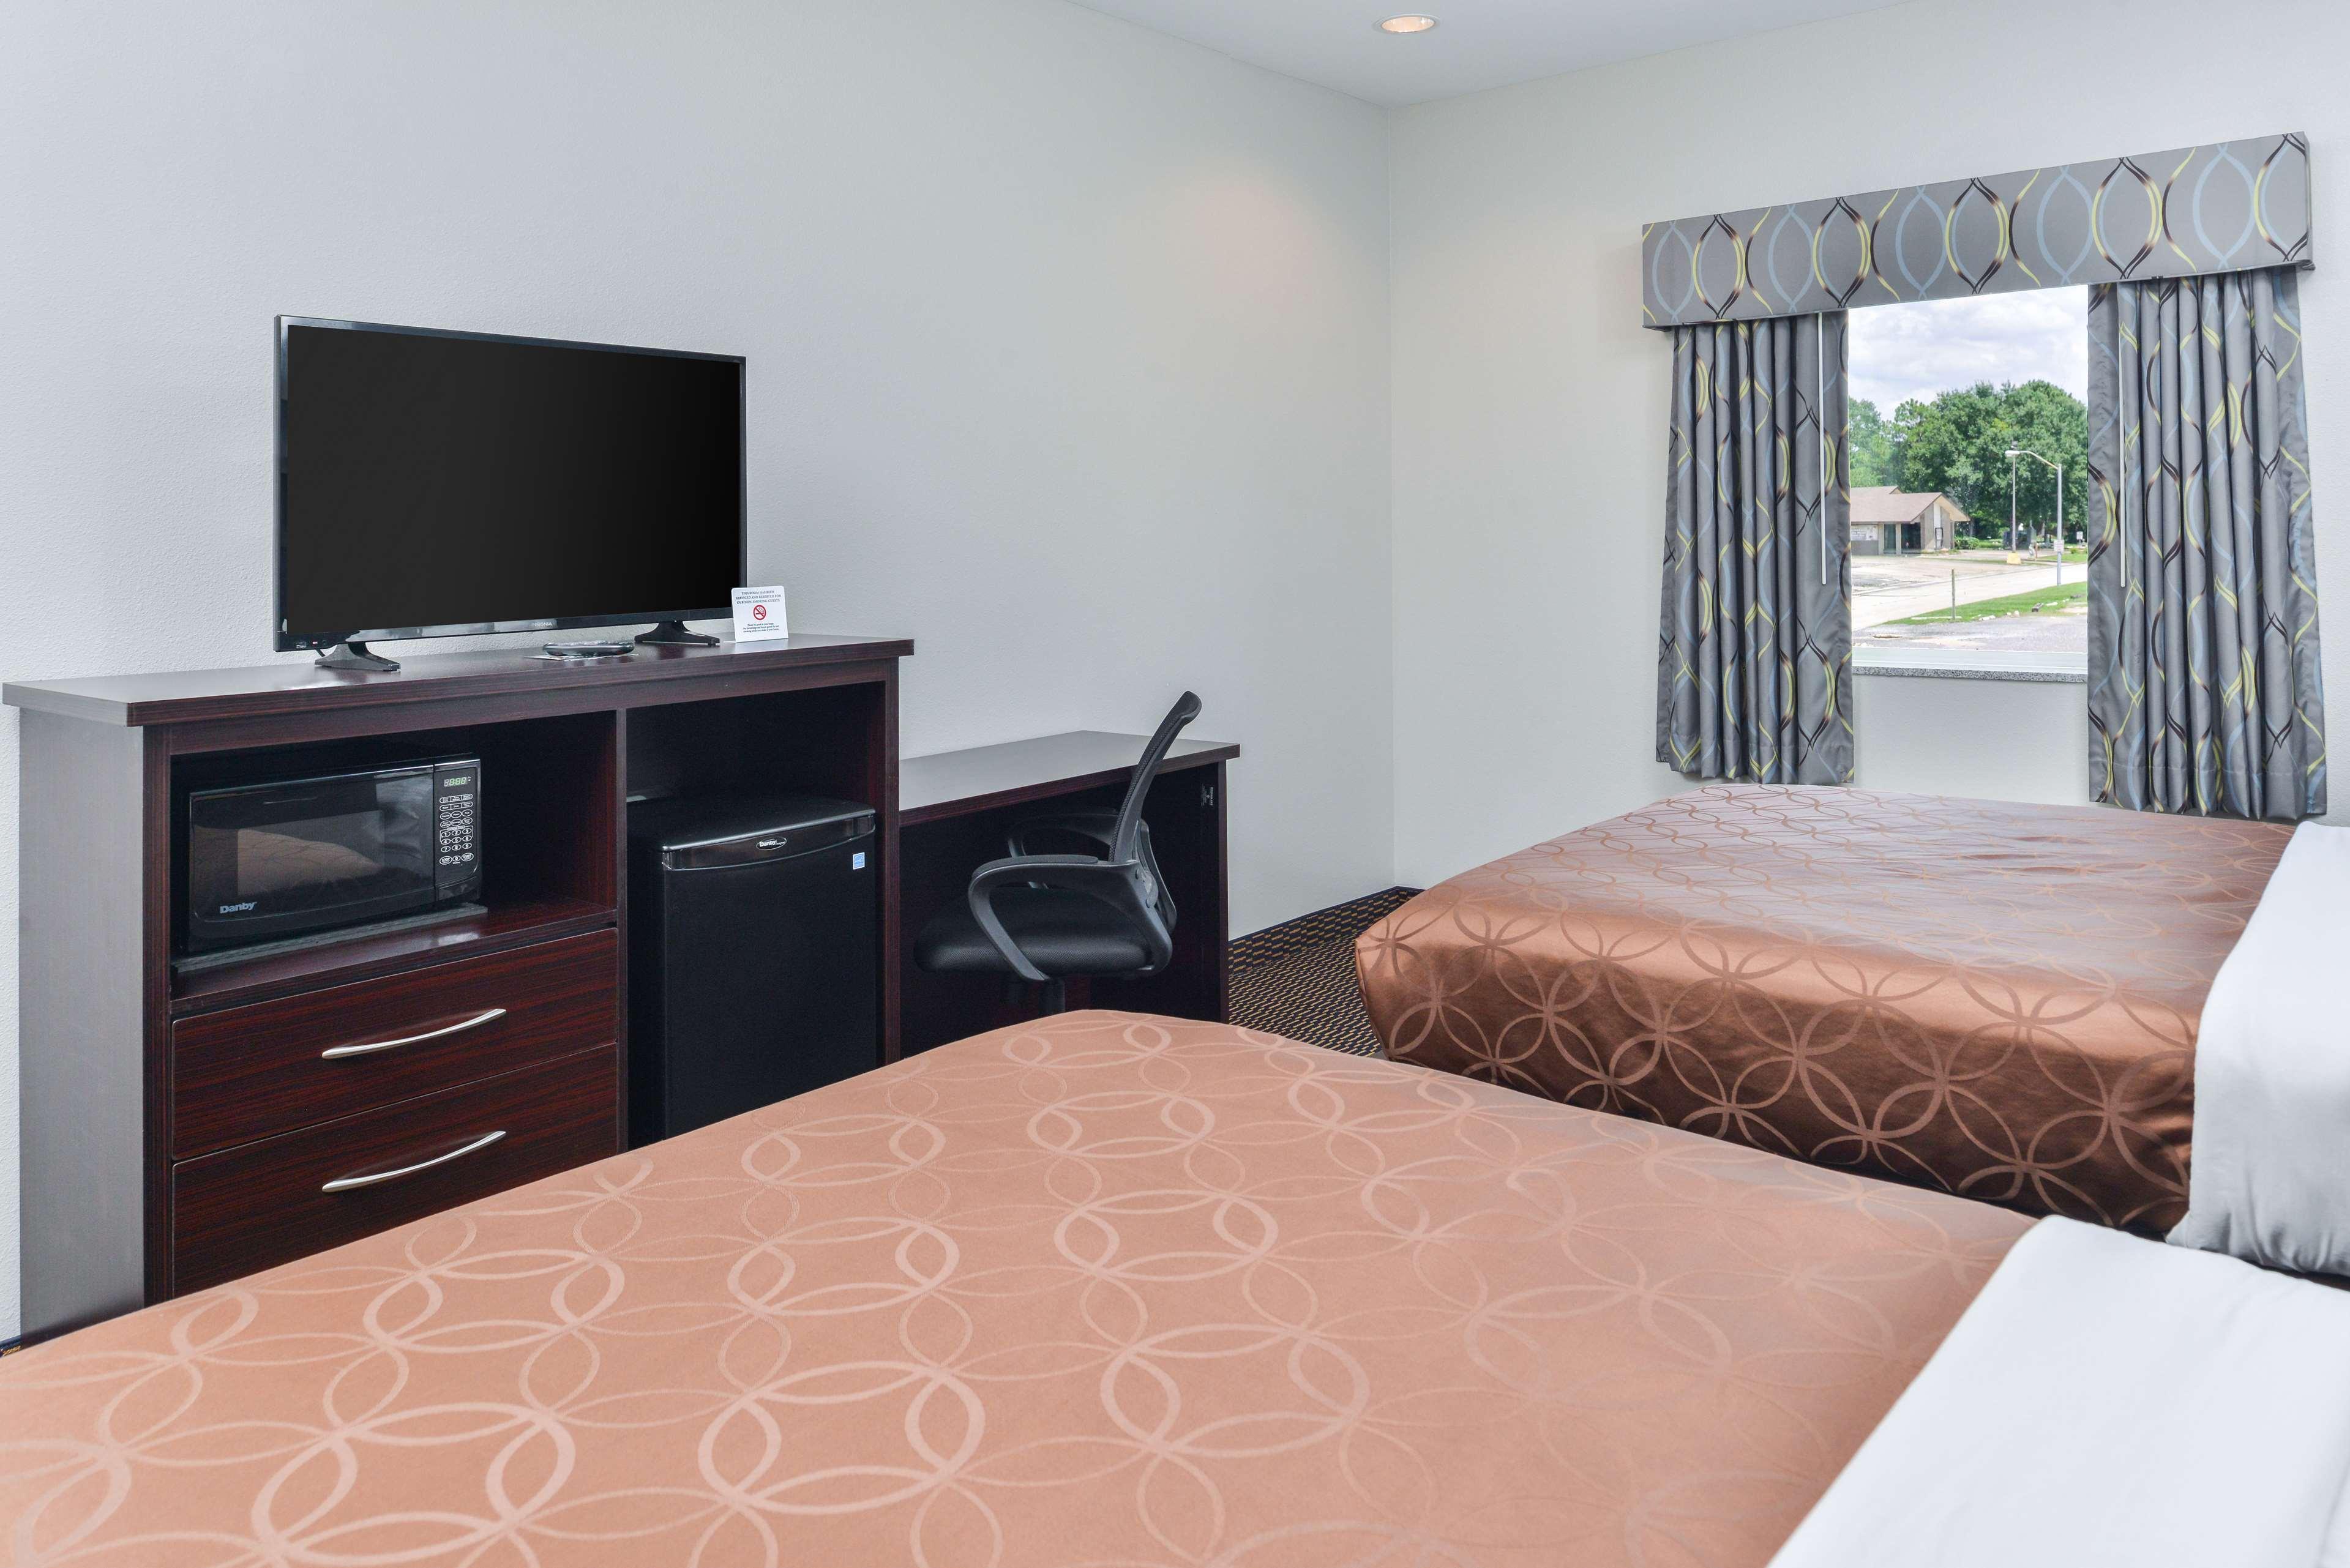 Americas Best Value Inn - Baton Rouge / College Drive image 13